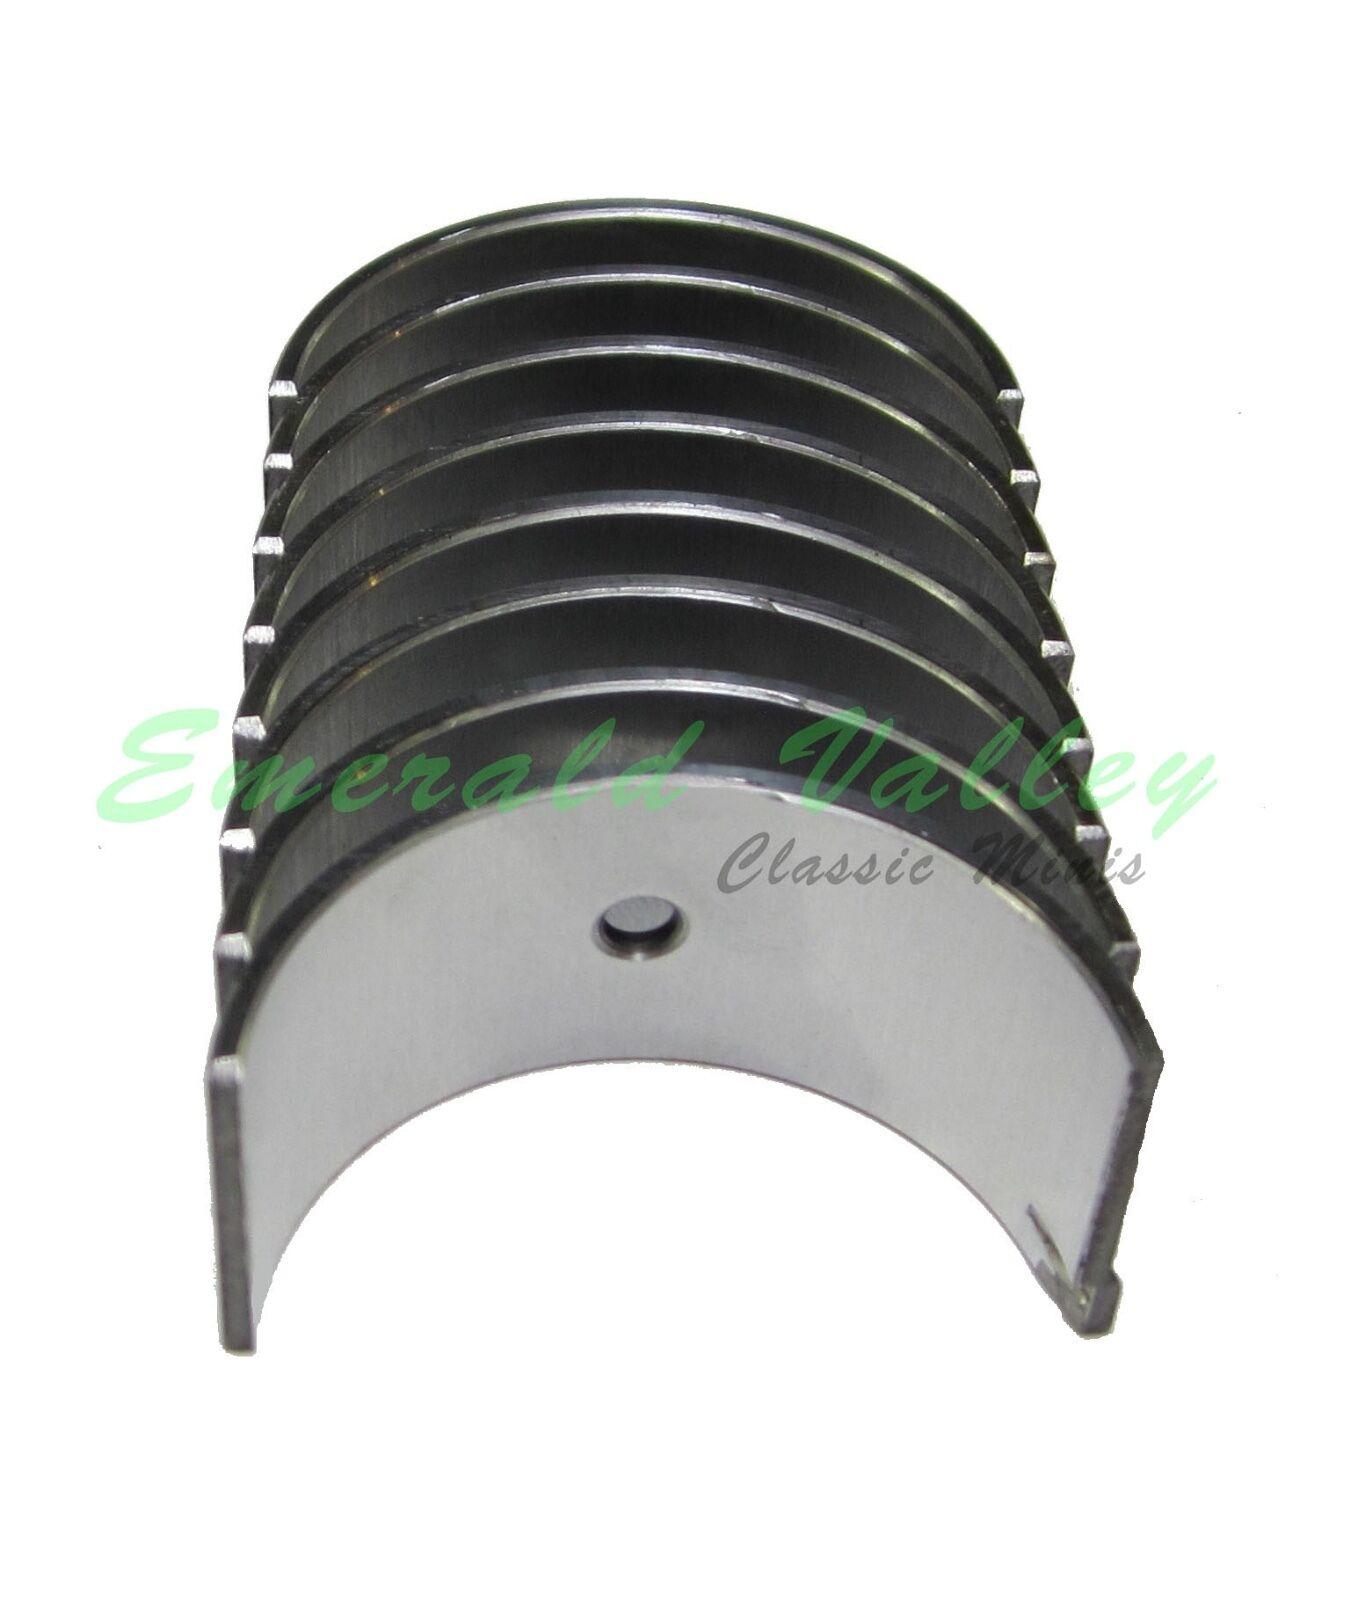 Classic Mini - New Bearing Set Bi-Metal Connecting Rod 040 A-Series